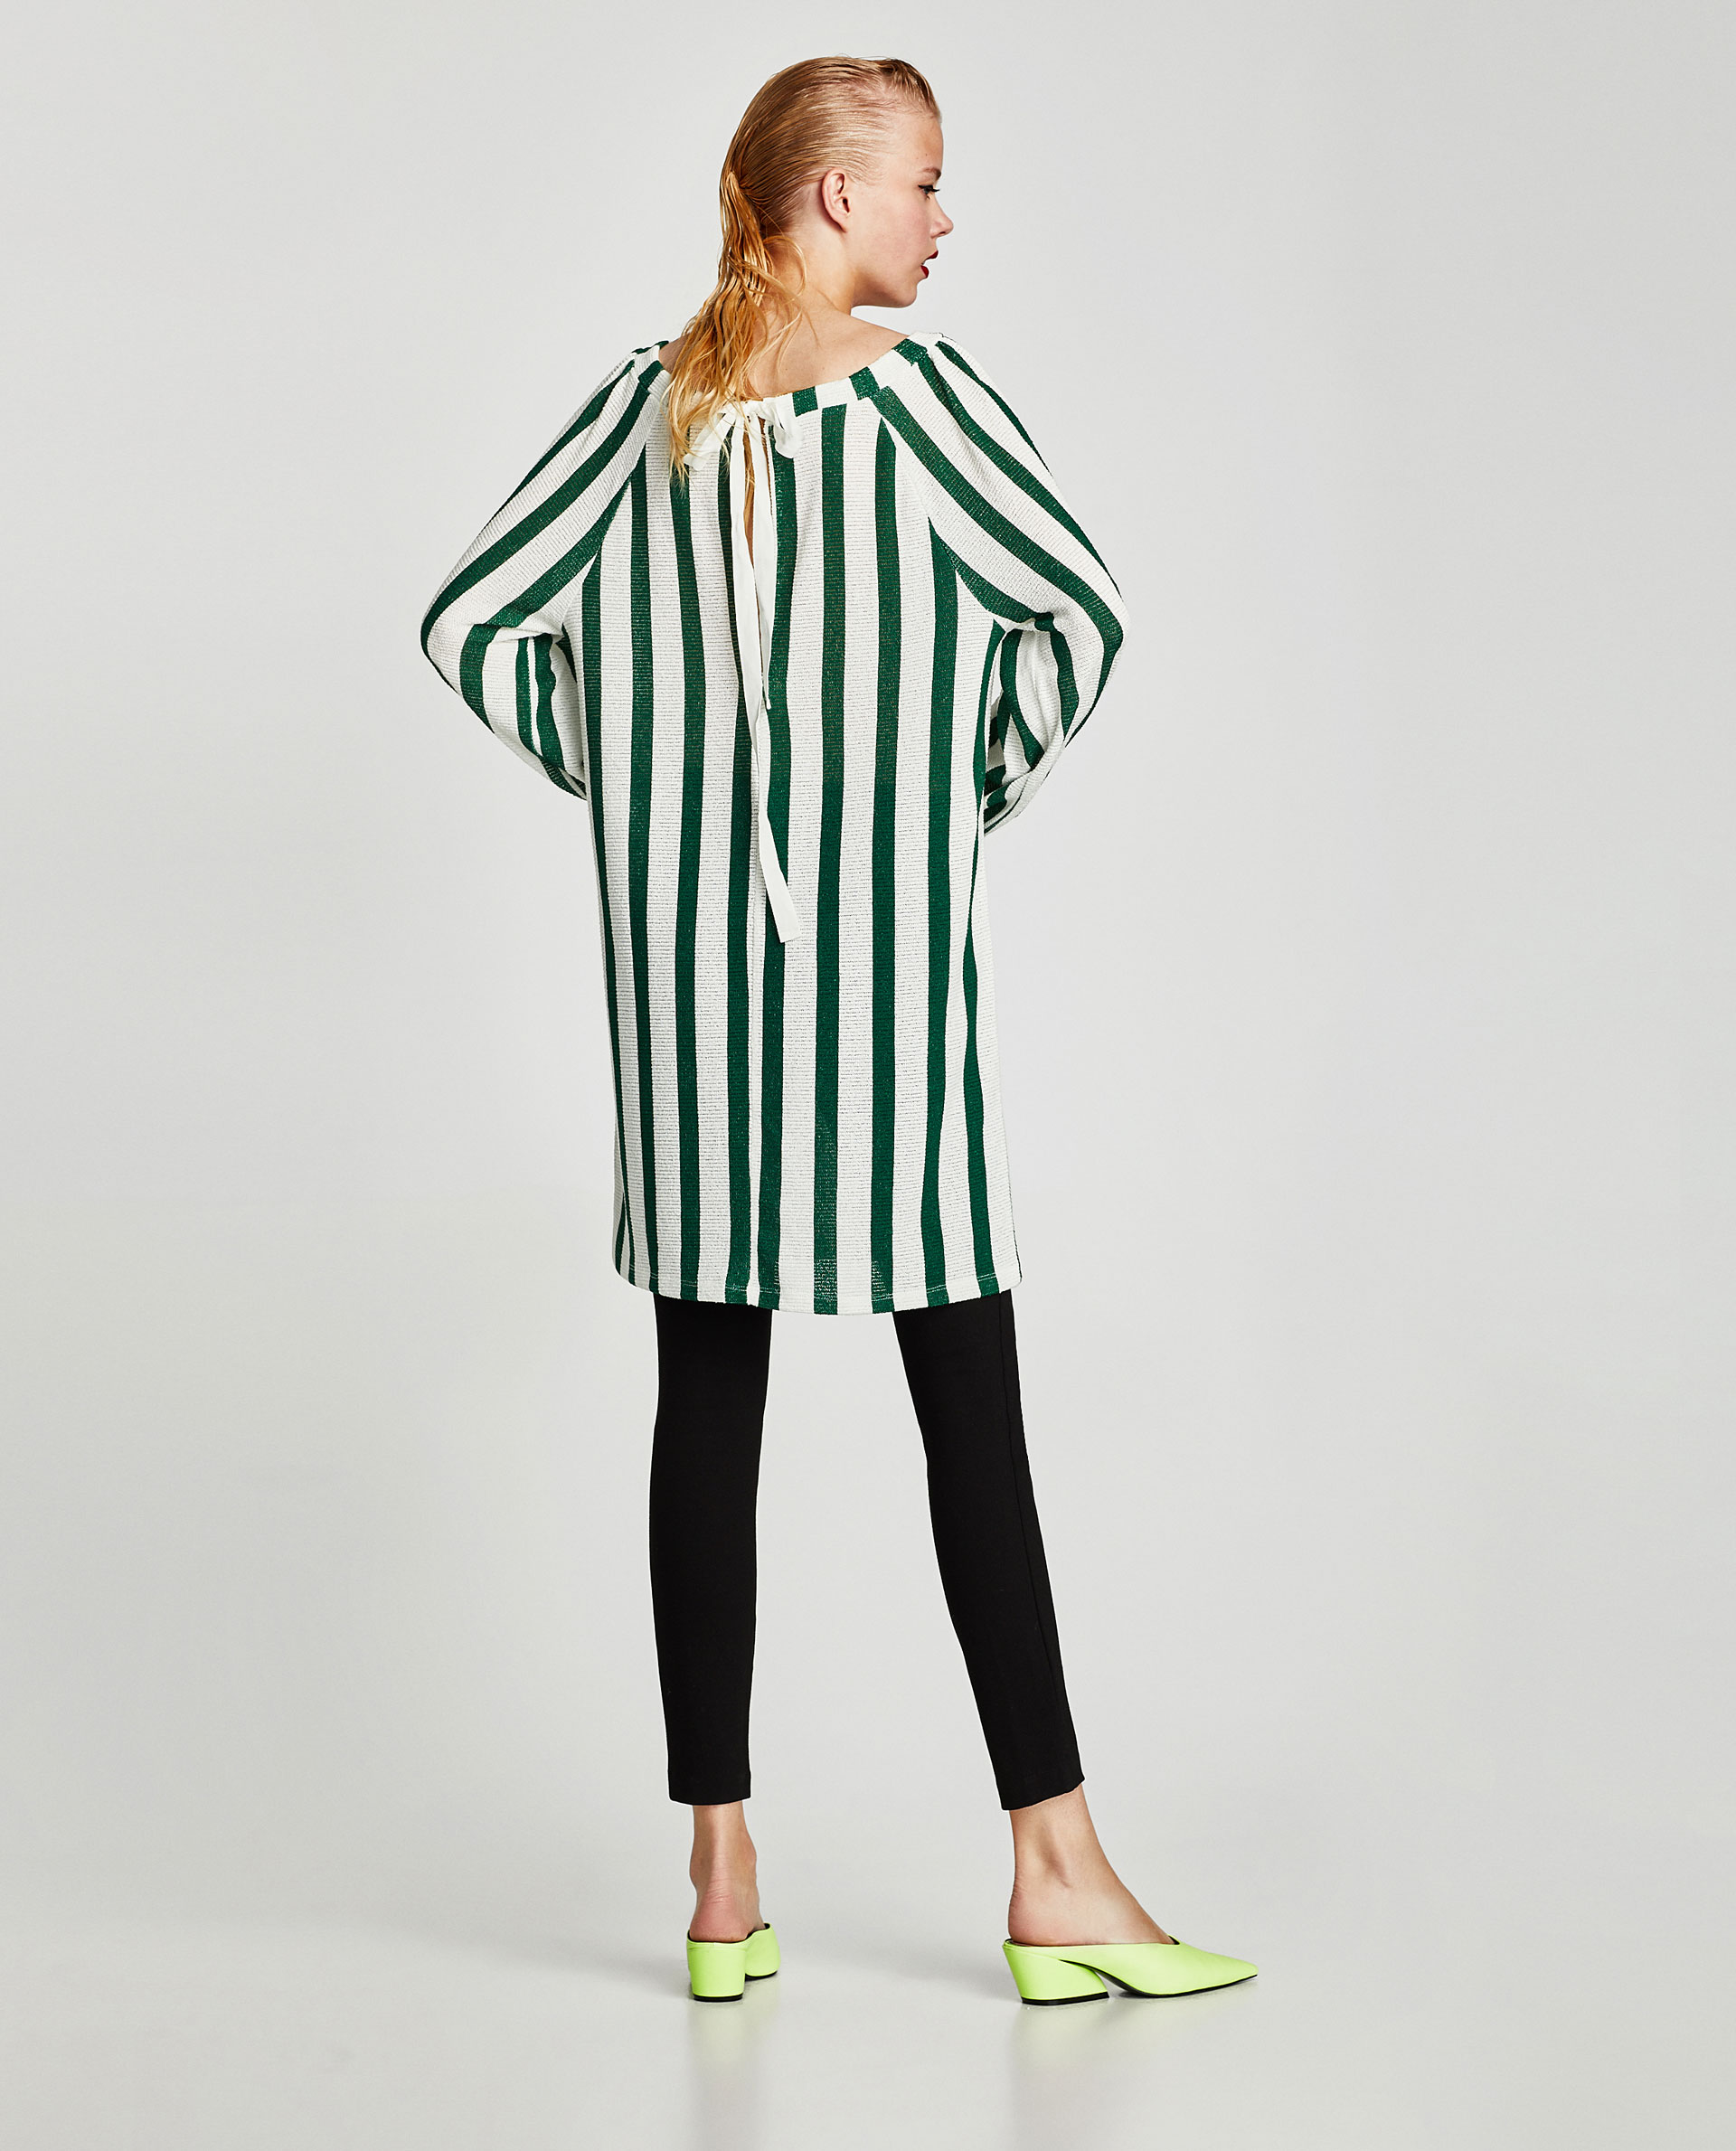 Sayuri Villalba – Zara TRAFALUC Green Stripes 5